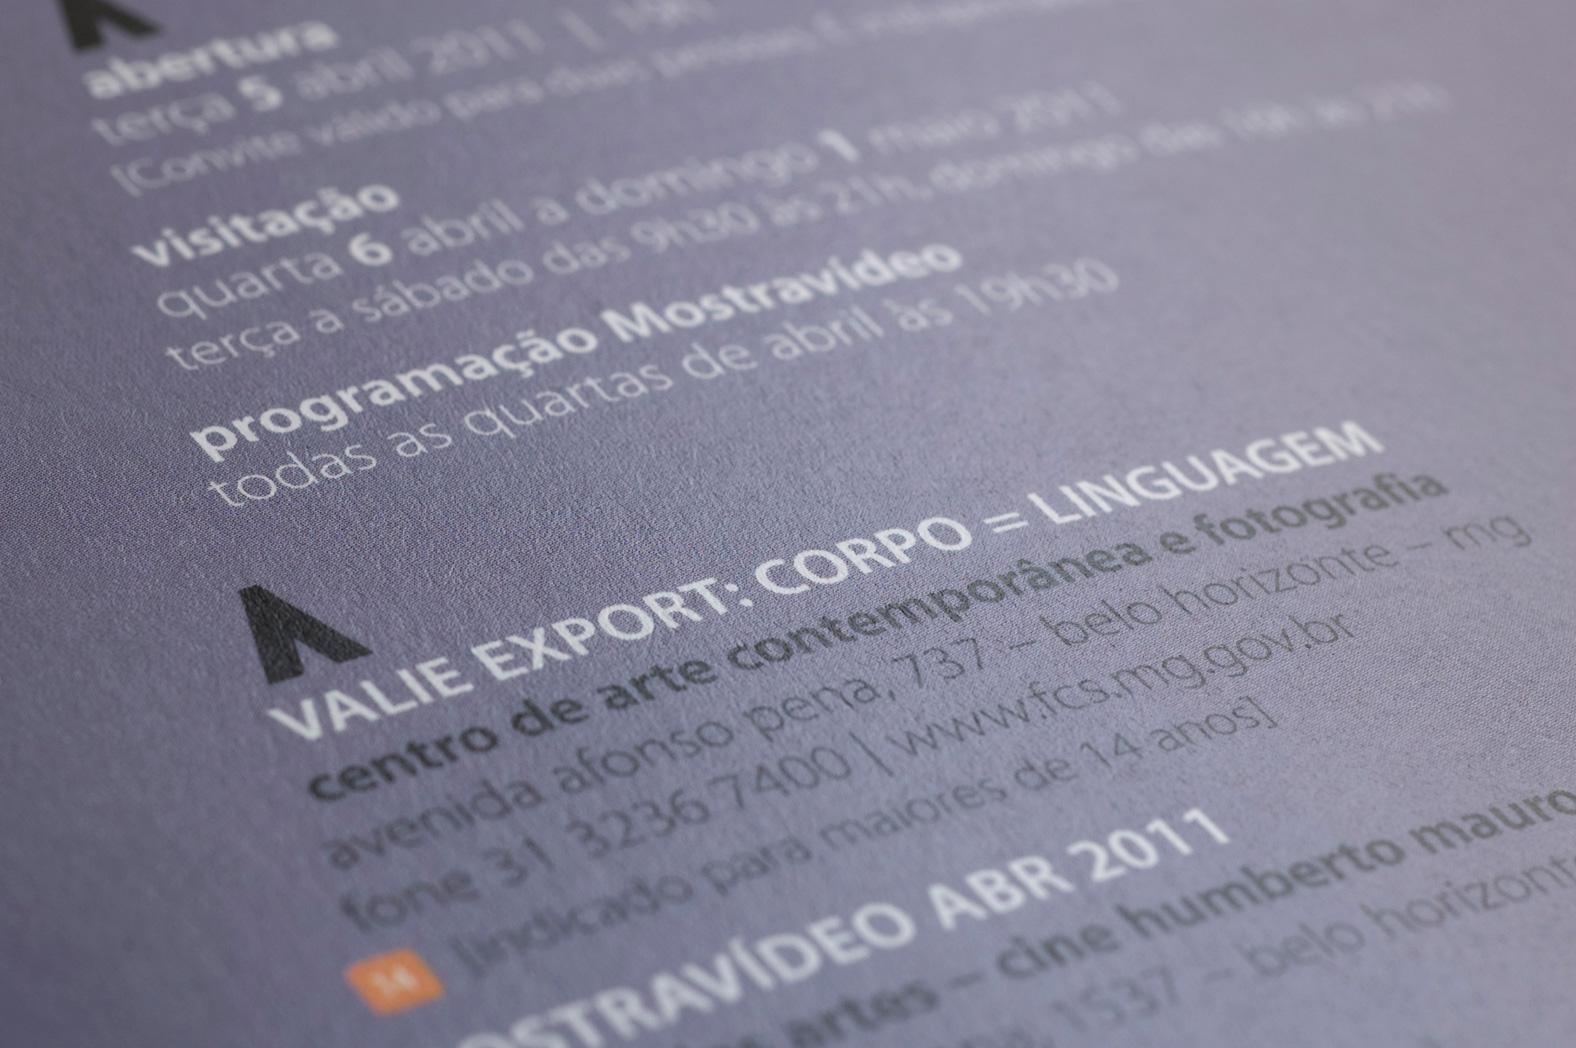 folder | detalhe da 4º capa